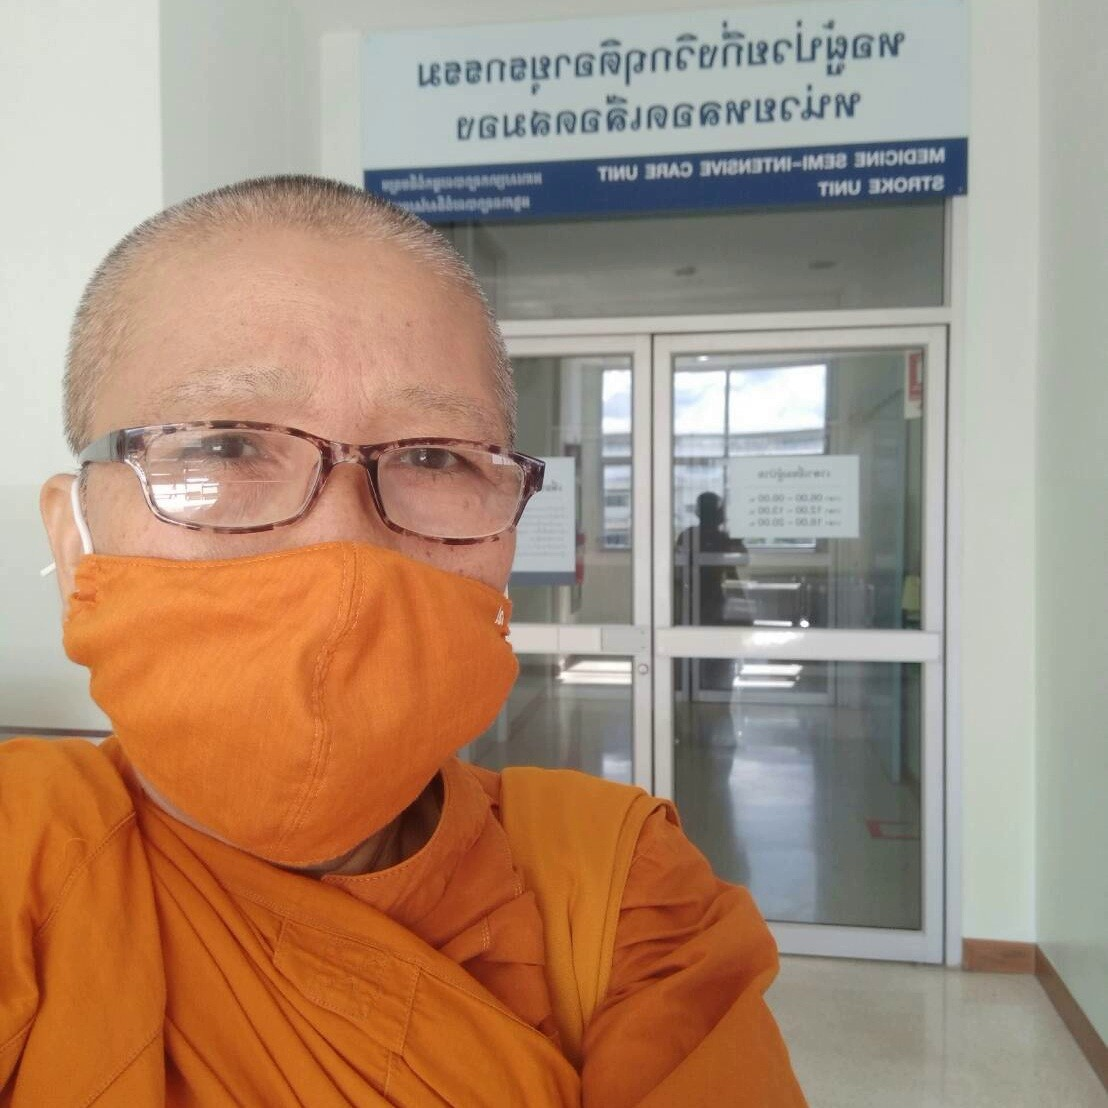 medizinische versorgung buddhirefuge